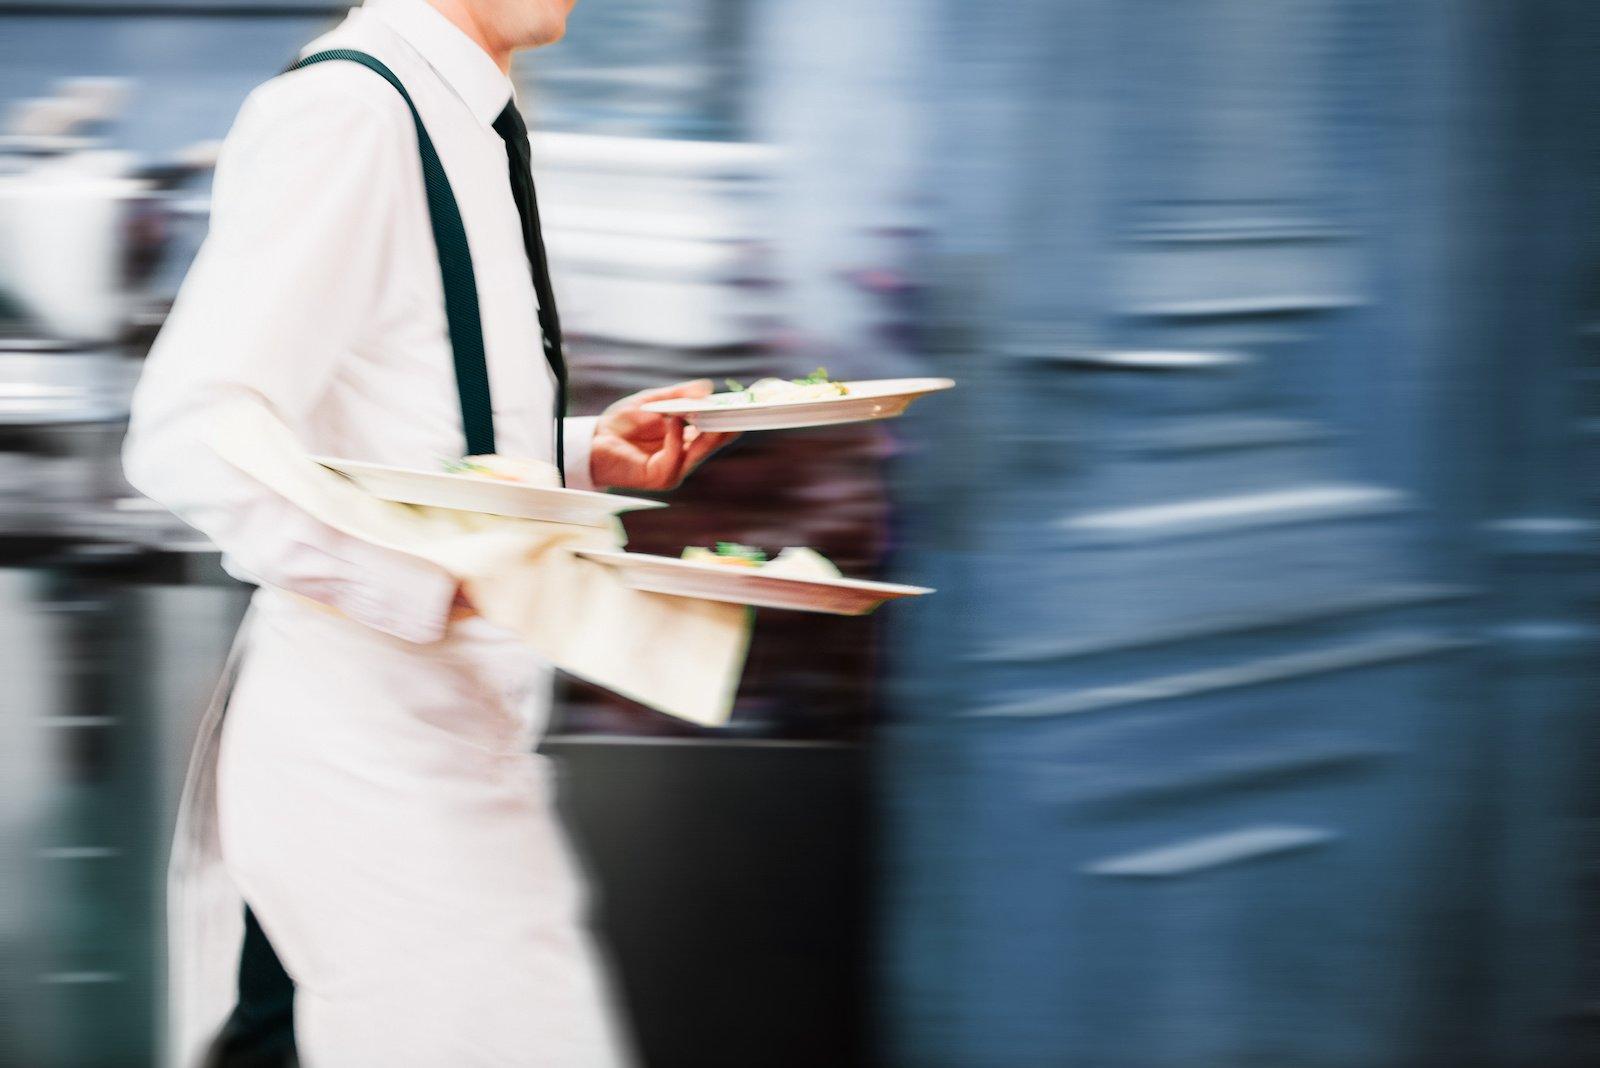 Restaurant employee running food